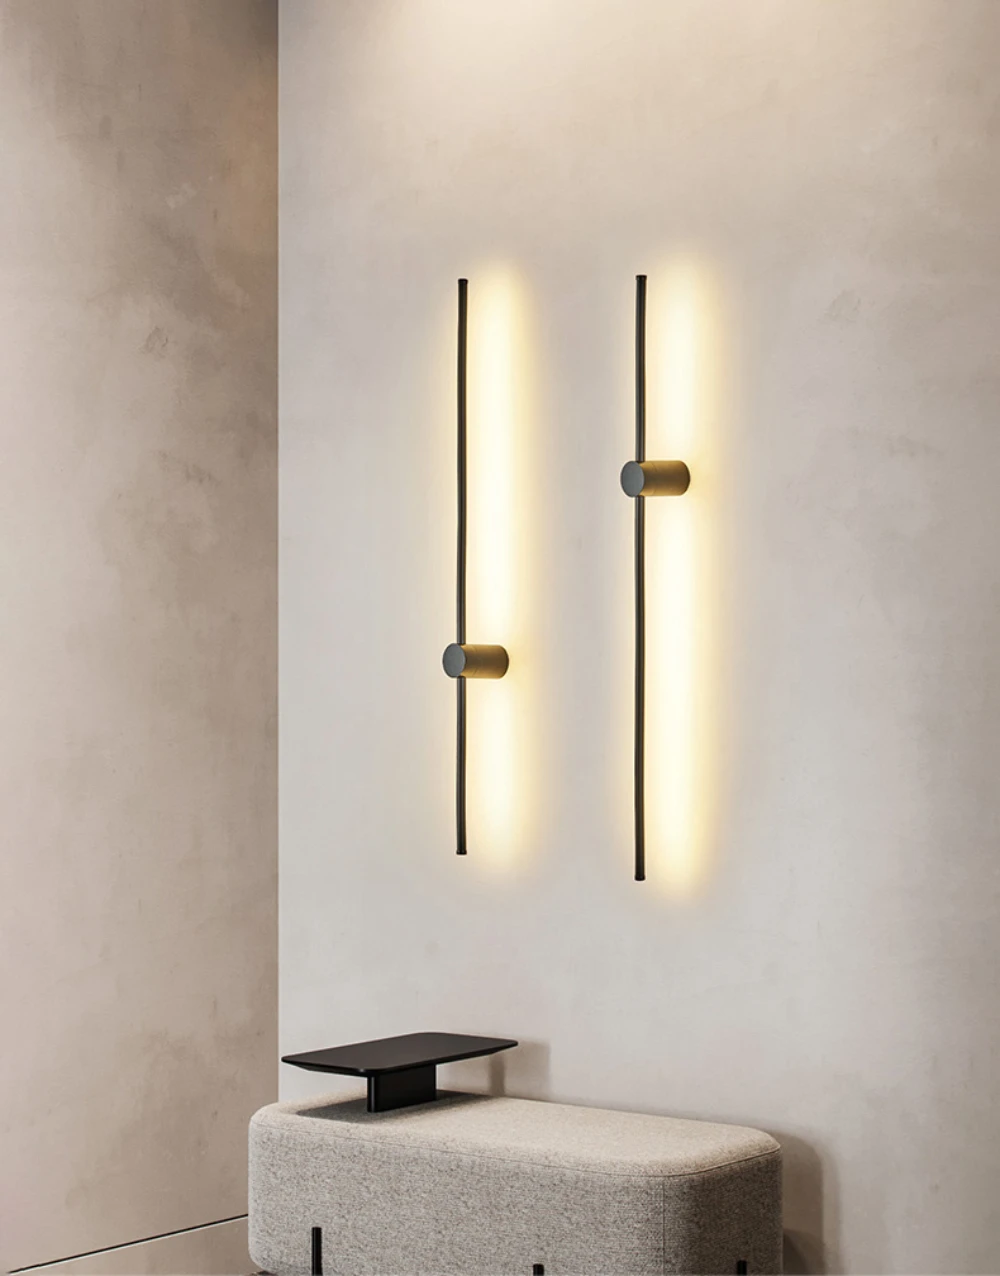 Linear Led Wall Light Mooielight In 2020 Wall Lights Interior Wall Light Fixtures Home Lighting Design